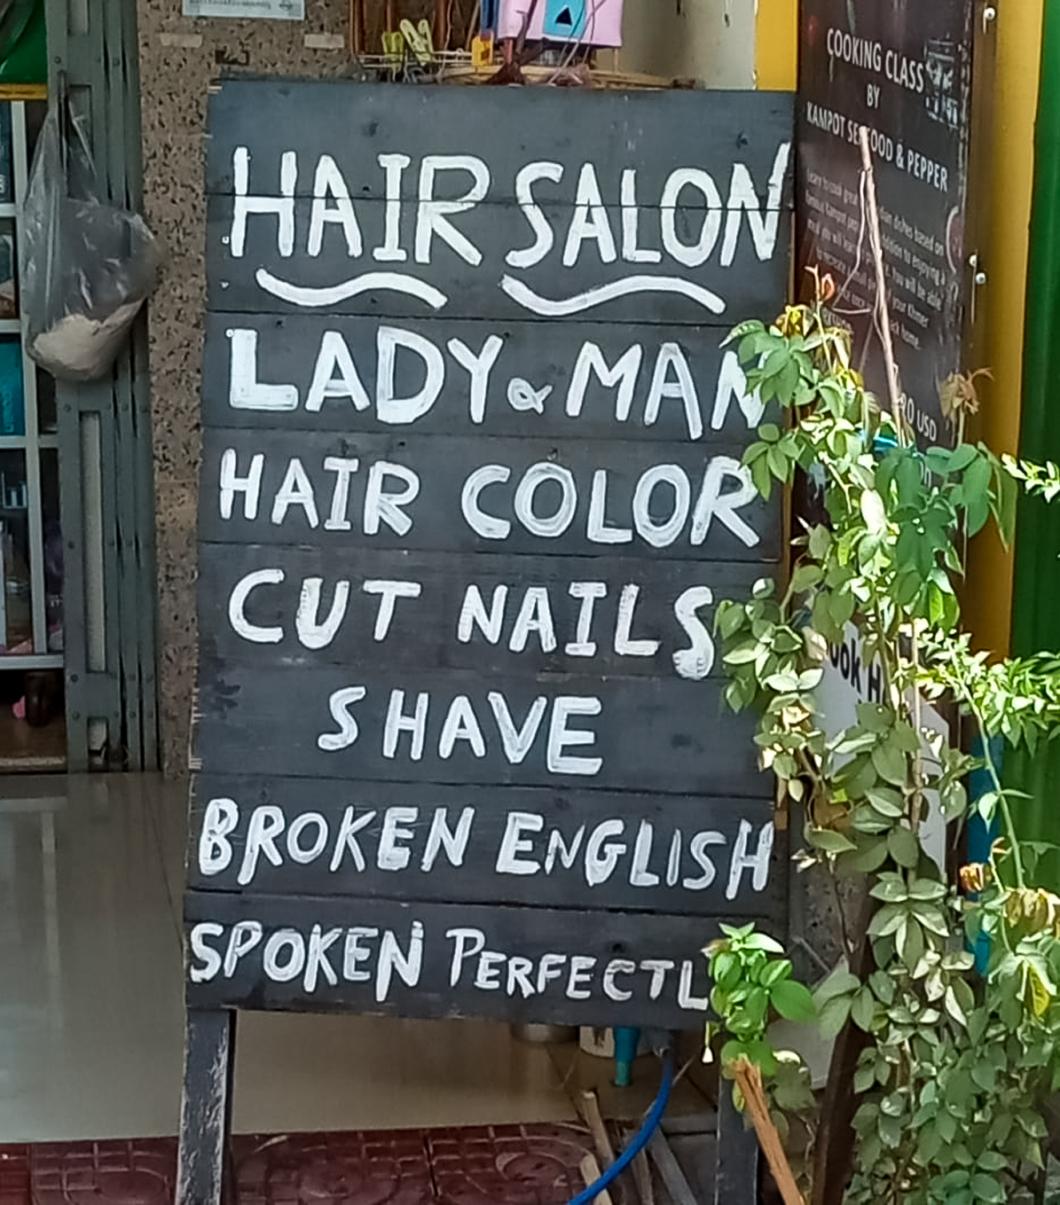 Broken english spoken perfectly sign.